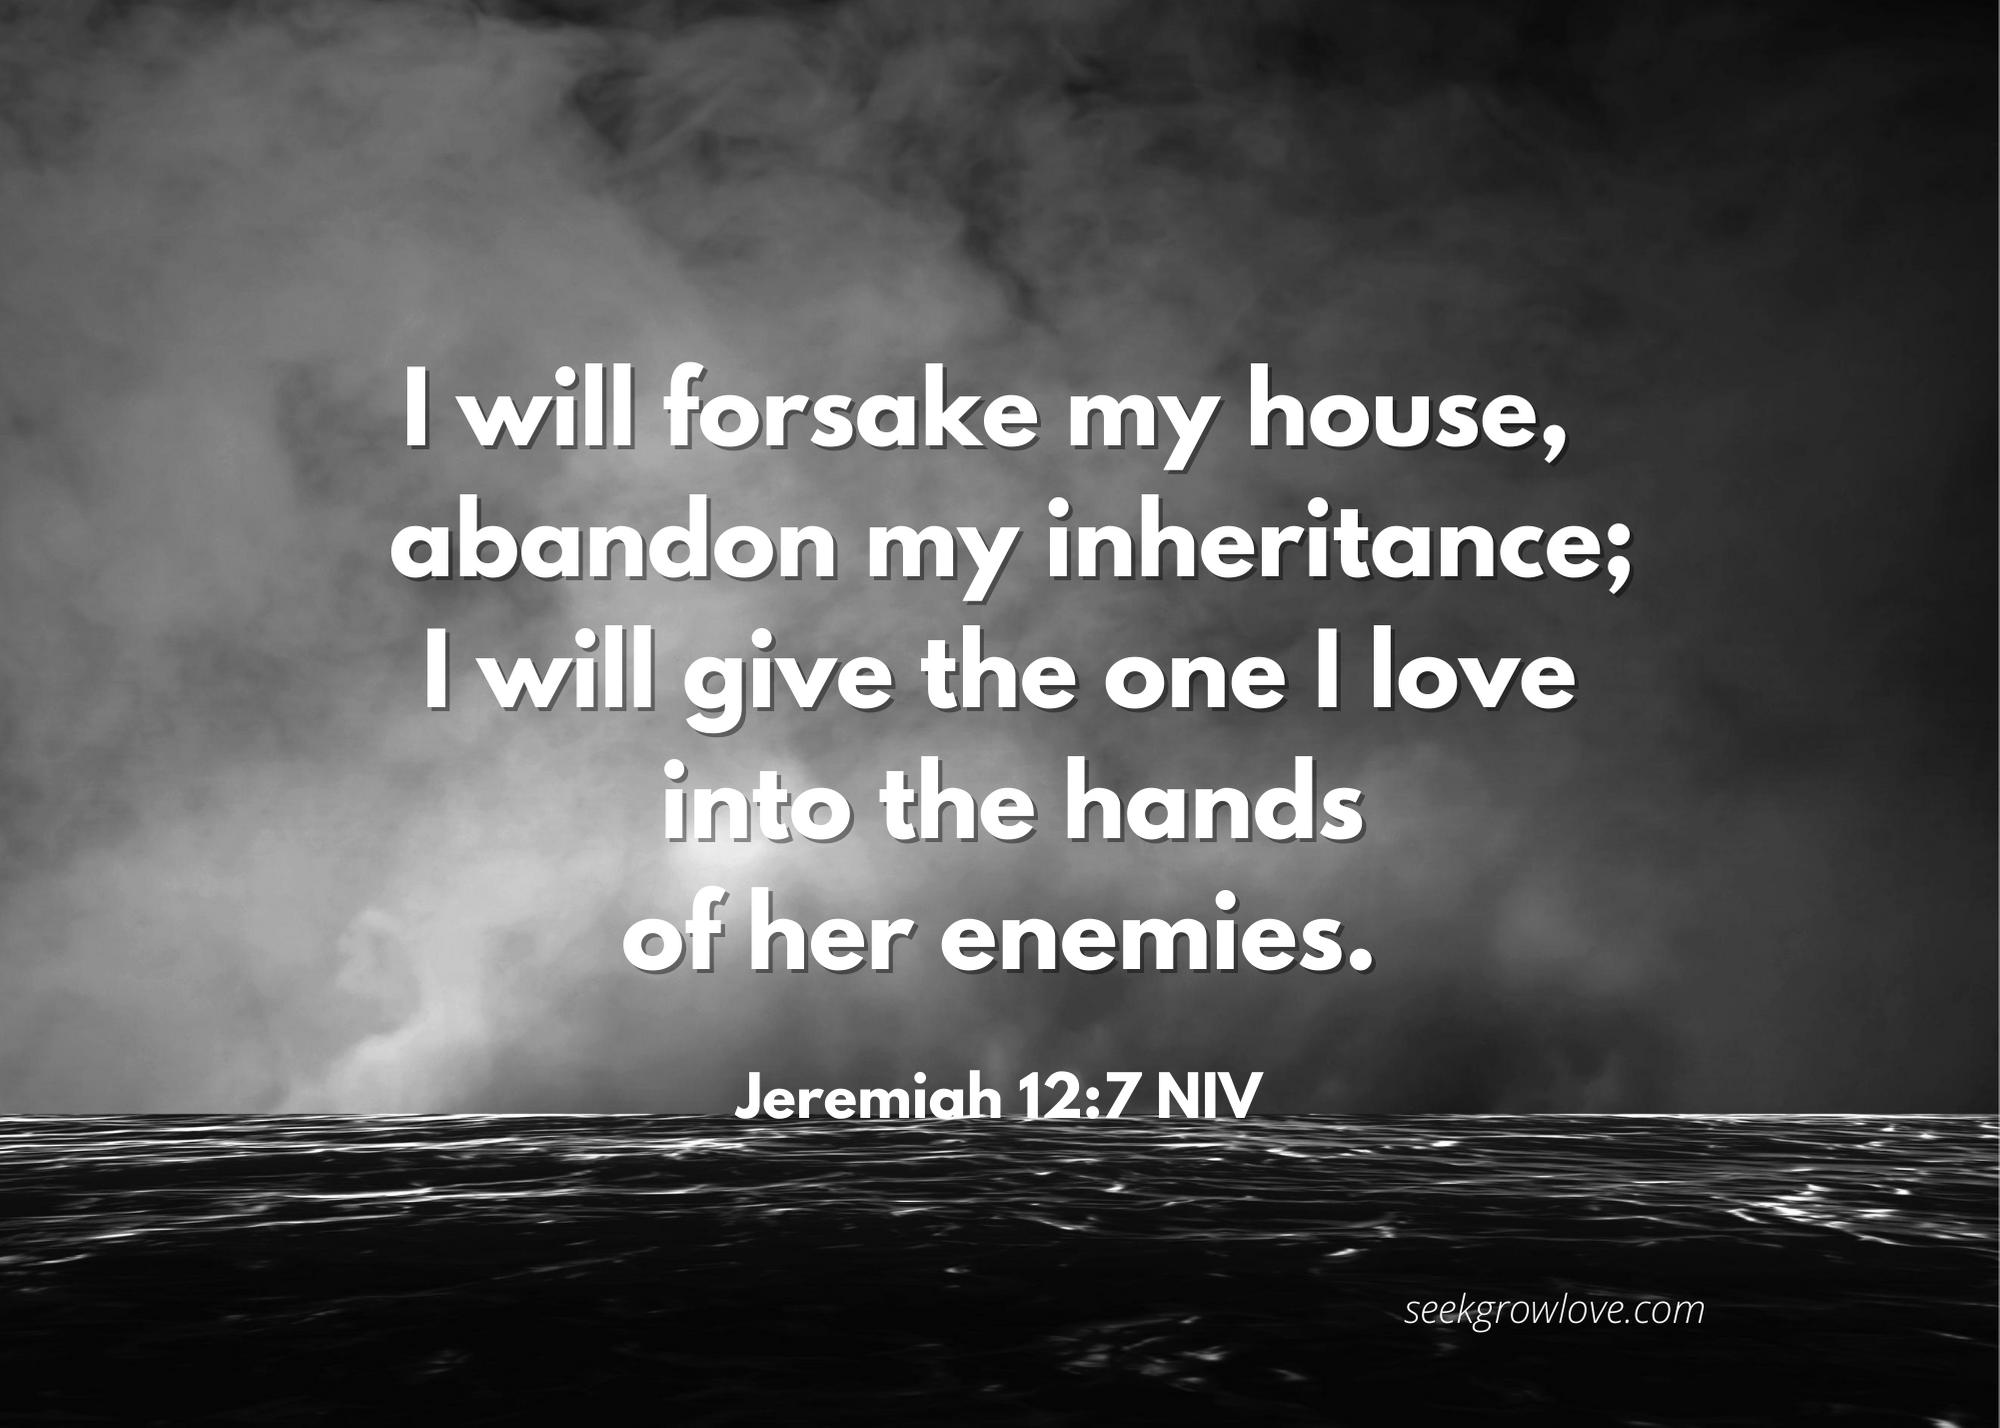 Jeremiah 12 7 NIV sgl